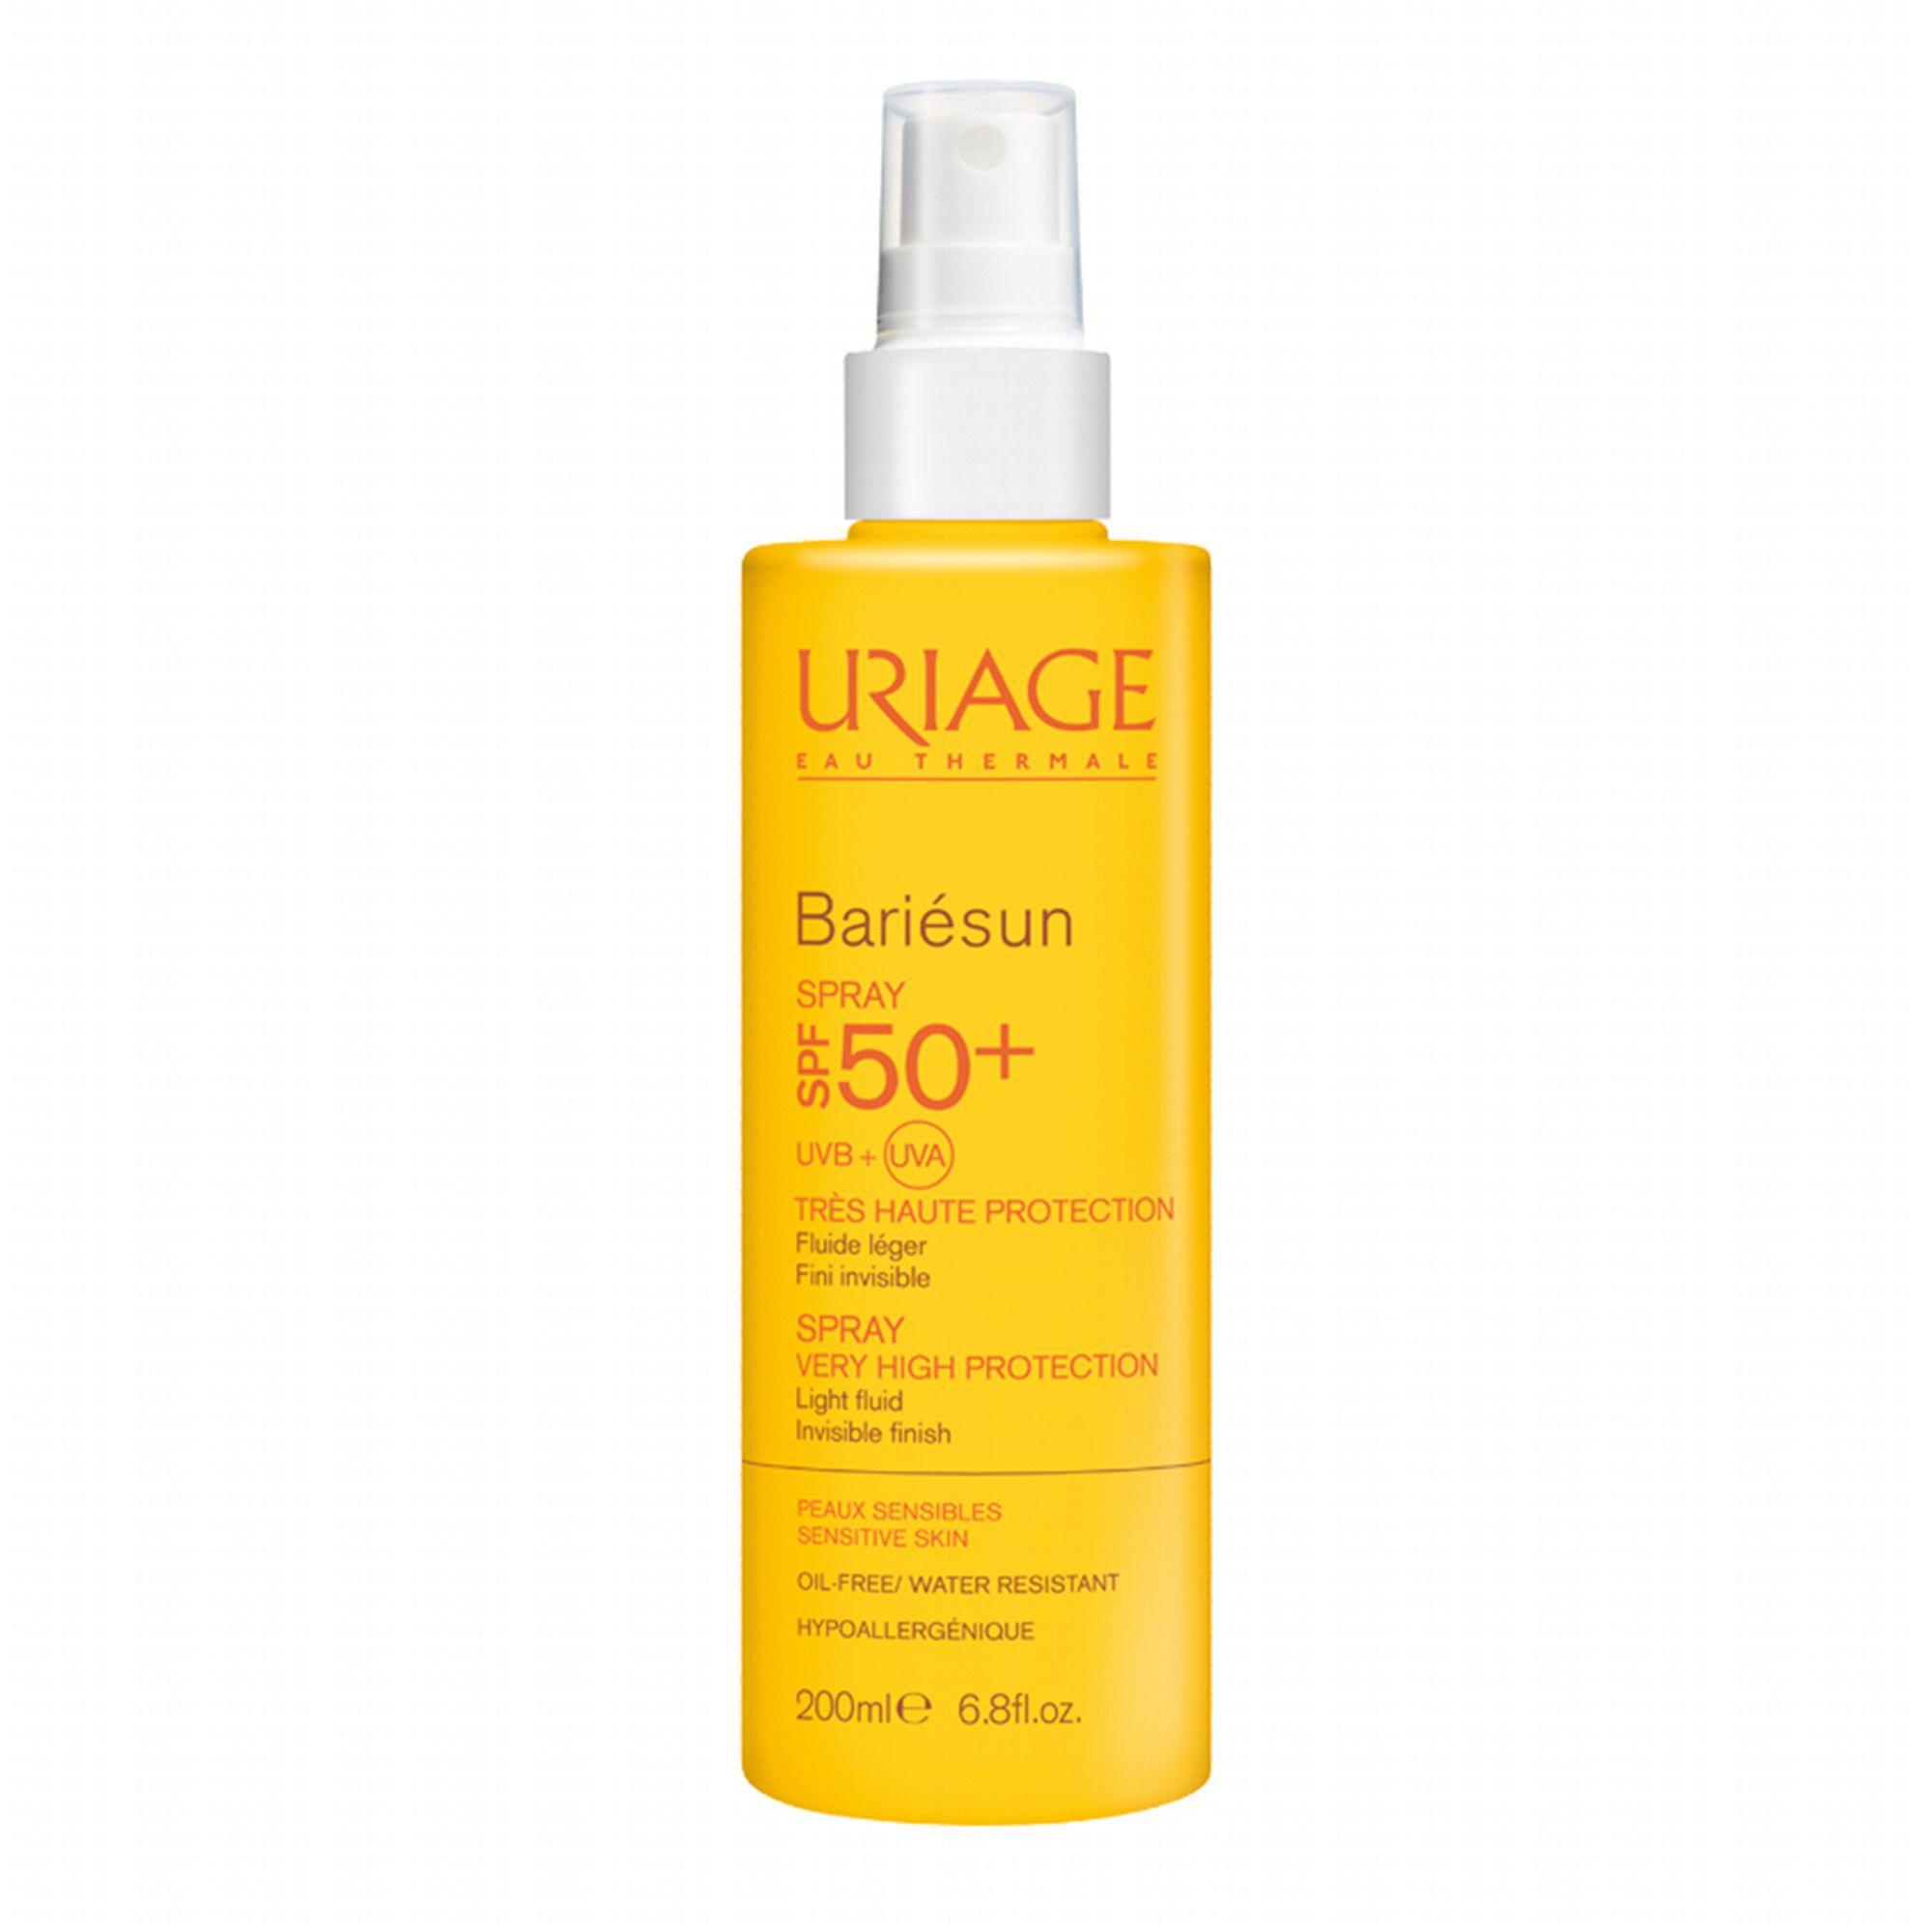 uriage barièsun spf50  spray 200ml